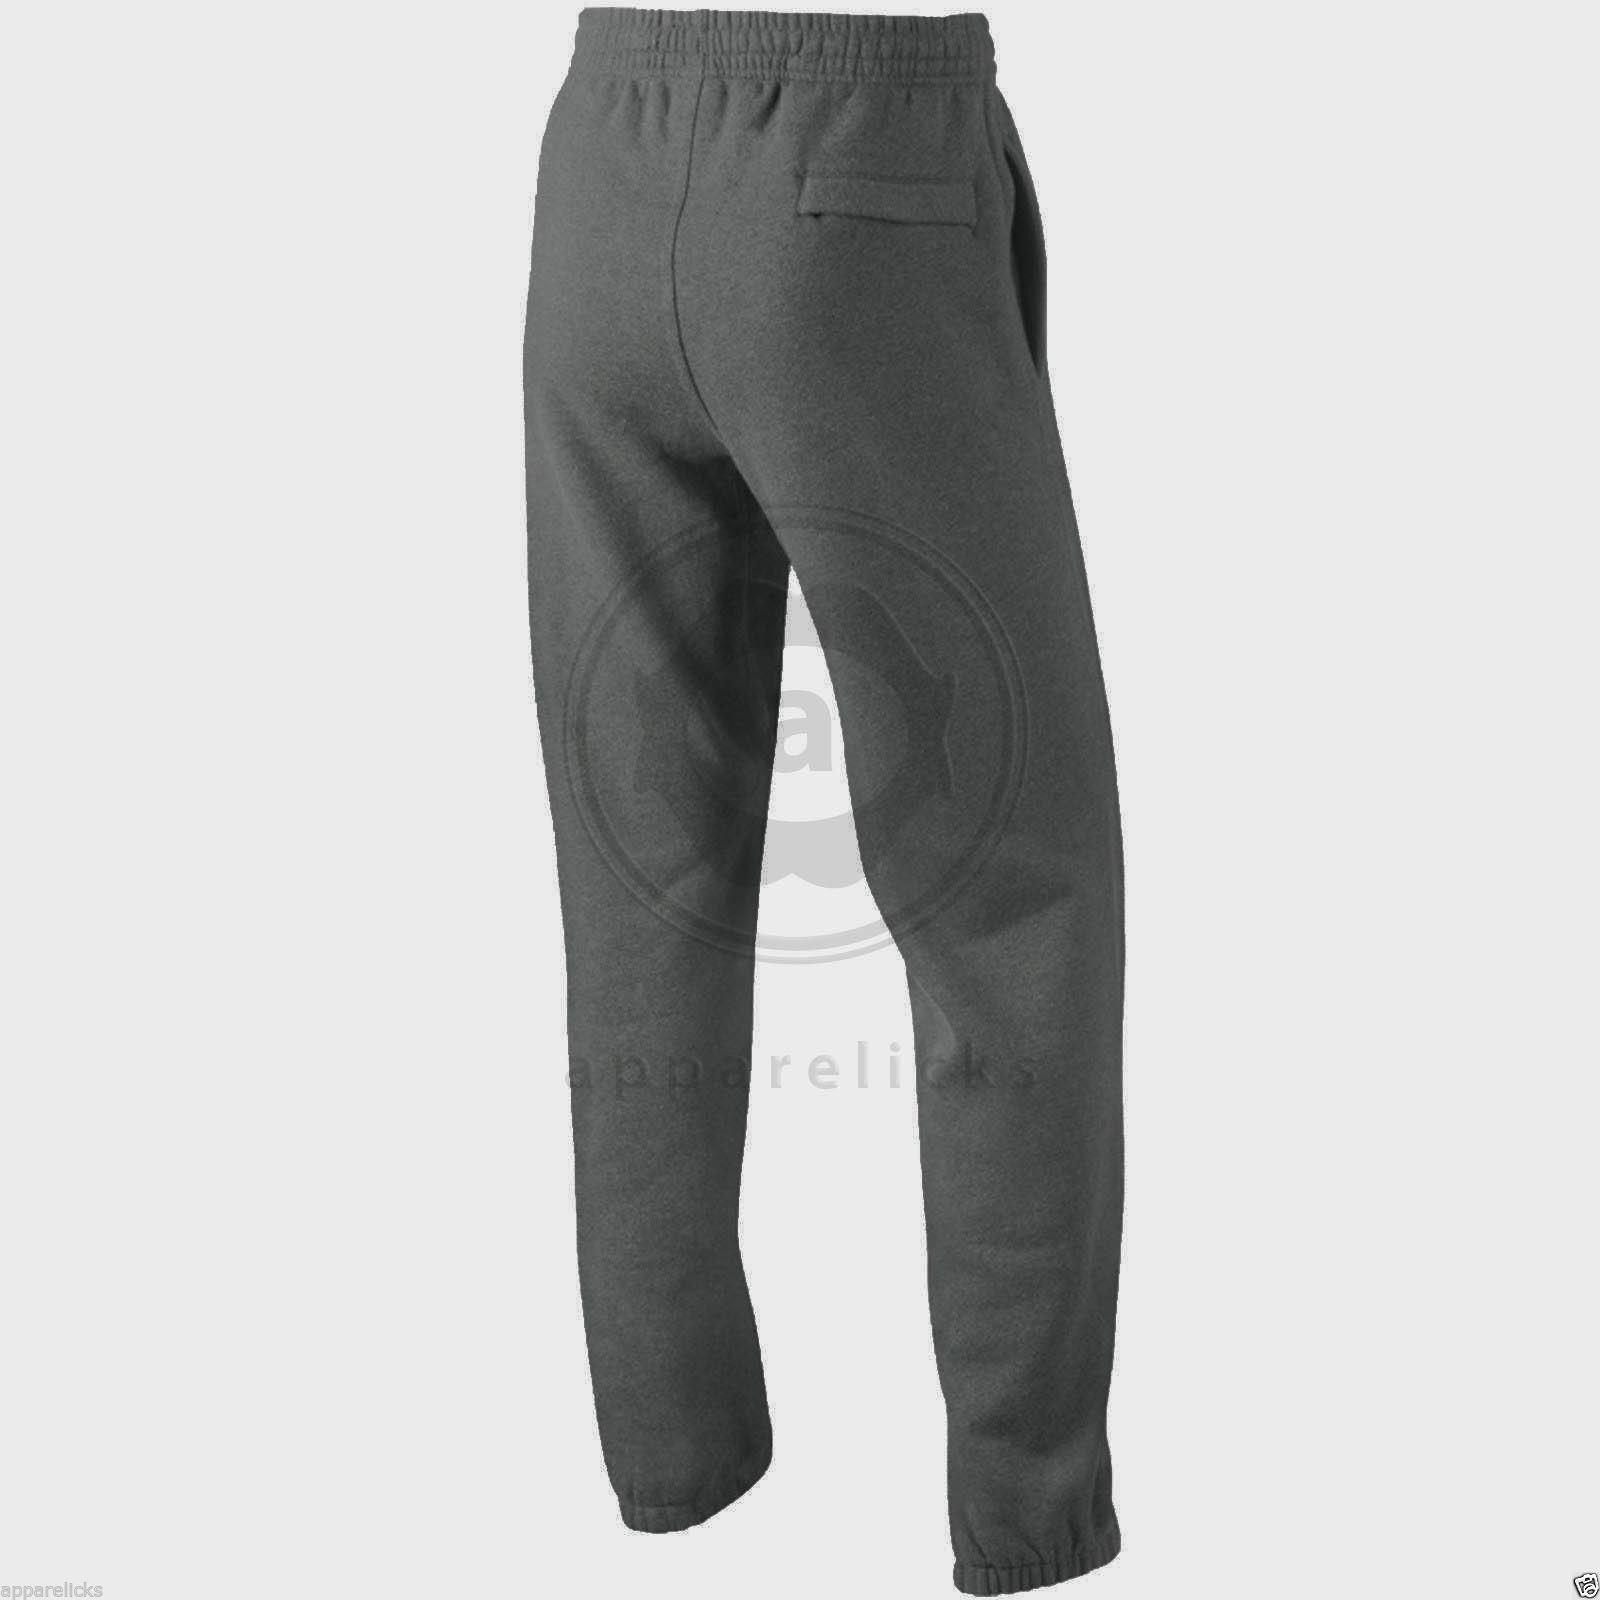 Mens / Mens Joggers; Refine Refine & Sort Mens Joggers. products. Related categories. Mens Outdoor Footwear; Mens Down Jackets; Mens Hats and Gloves; Mens Hi Tops; Slazenger Cuffed Fleece Jogging Pants Mens. $ Sizes: S, M, L, XL, 2XL. Slazenger Cuffed Fleece Jogging Pants Mens. $ Sizes: S Slazenger.